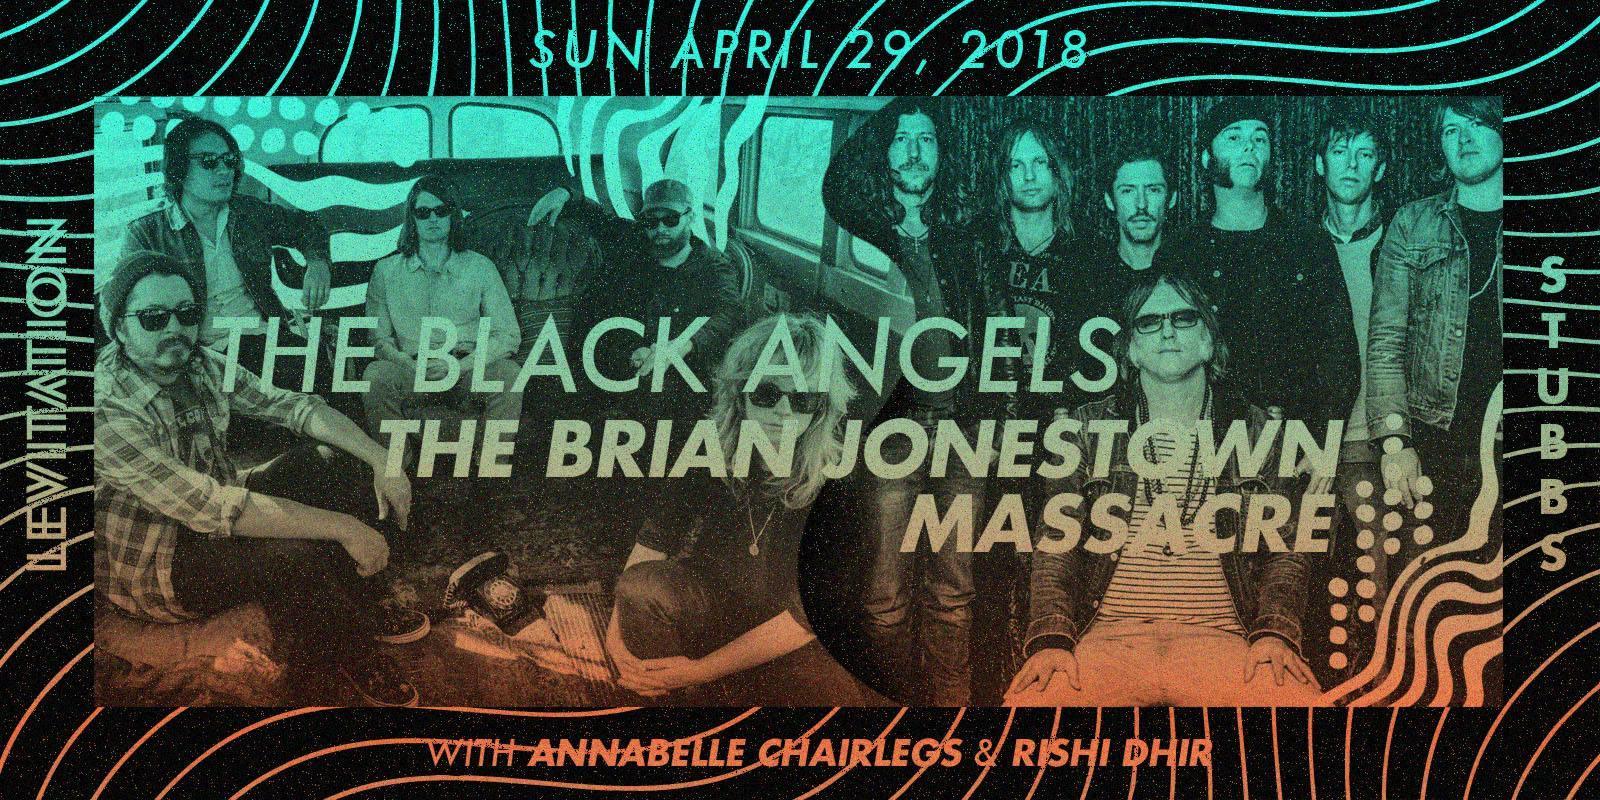 The Black Angels, The Brian Jonestown Massacre + more